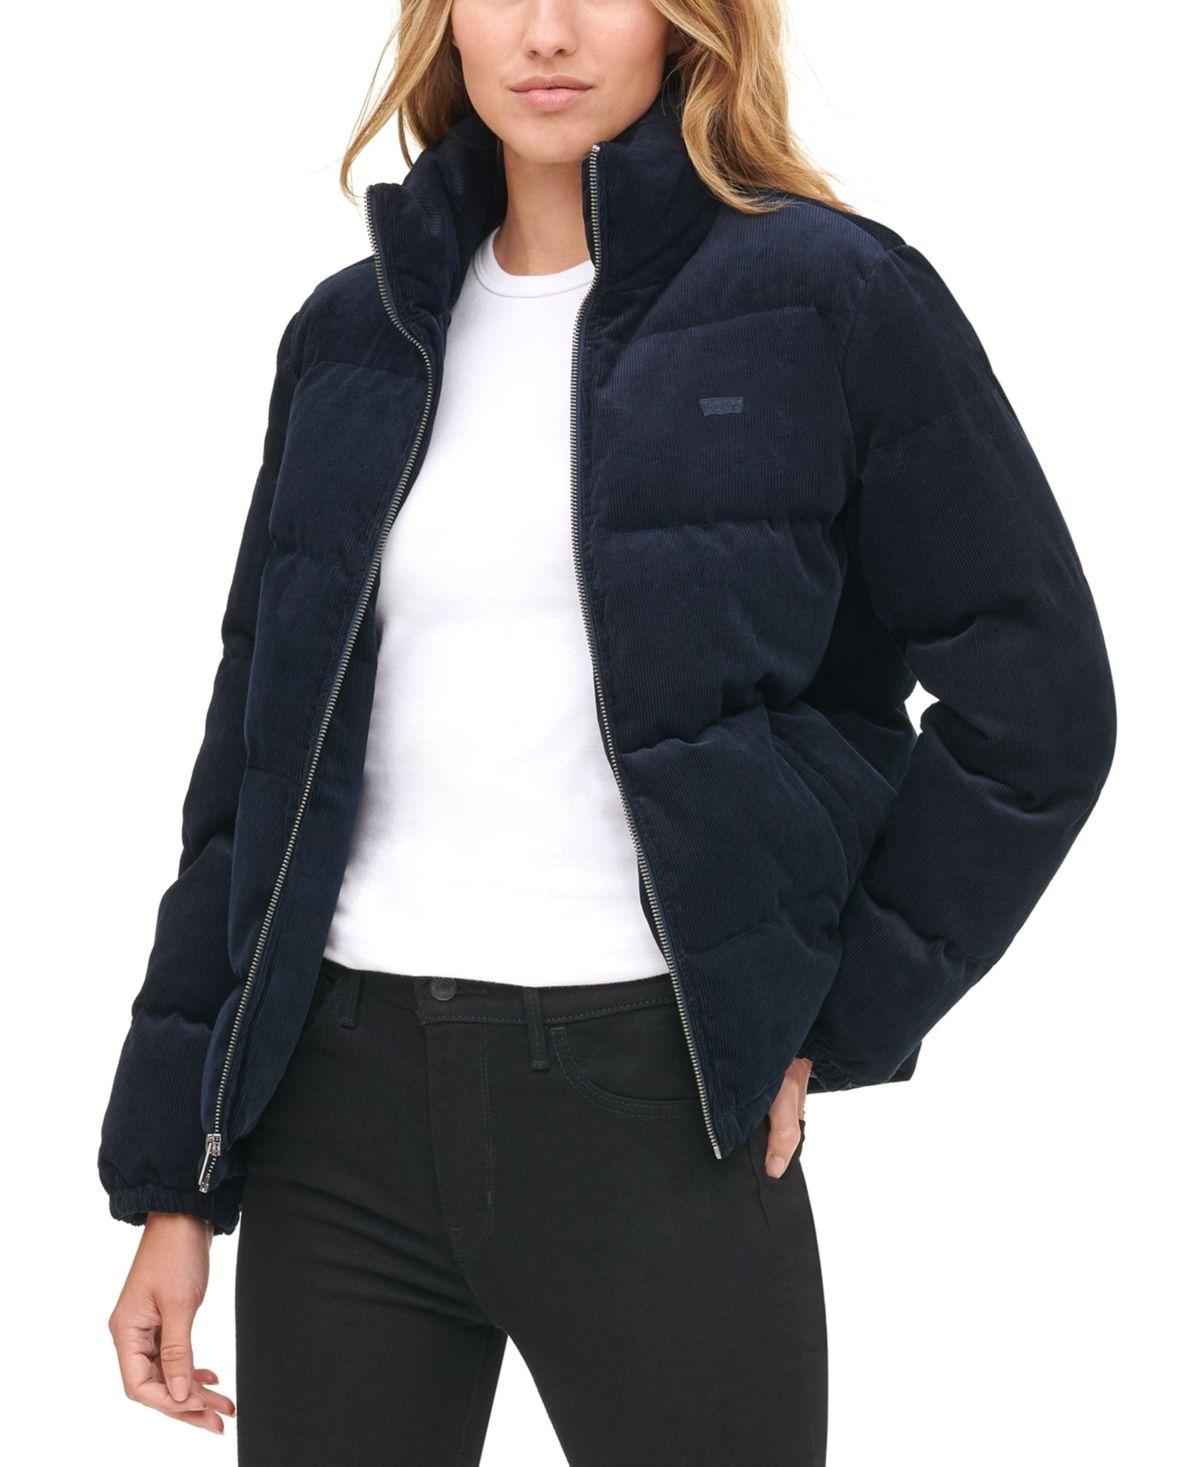 Pin By Chantal On Fashion Inspiration Corduroy Puffer Jacket Jacket Outfit Women Blue Puffer Jacket [ 1467 x 1200 Pixel ]